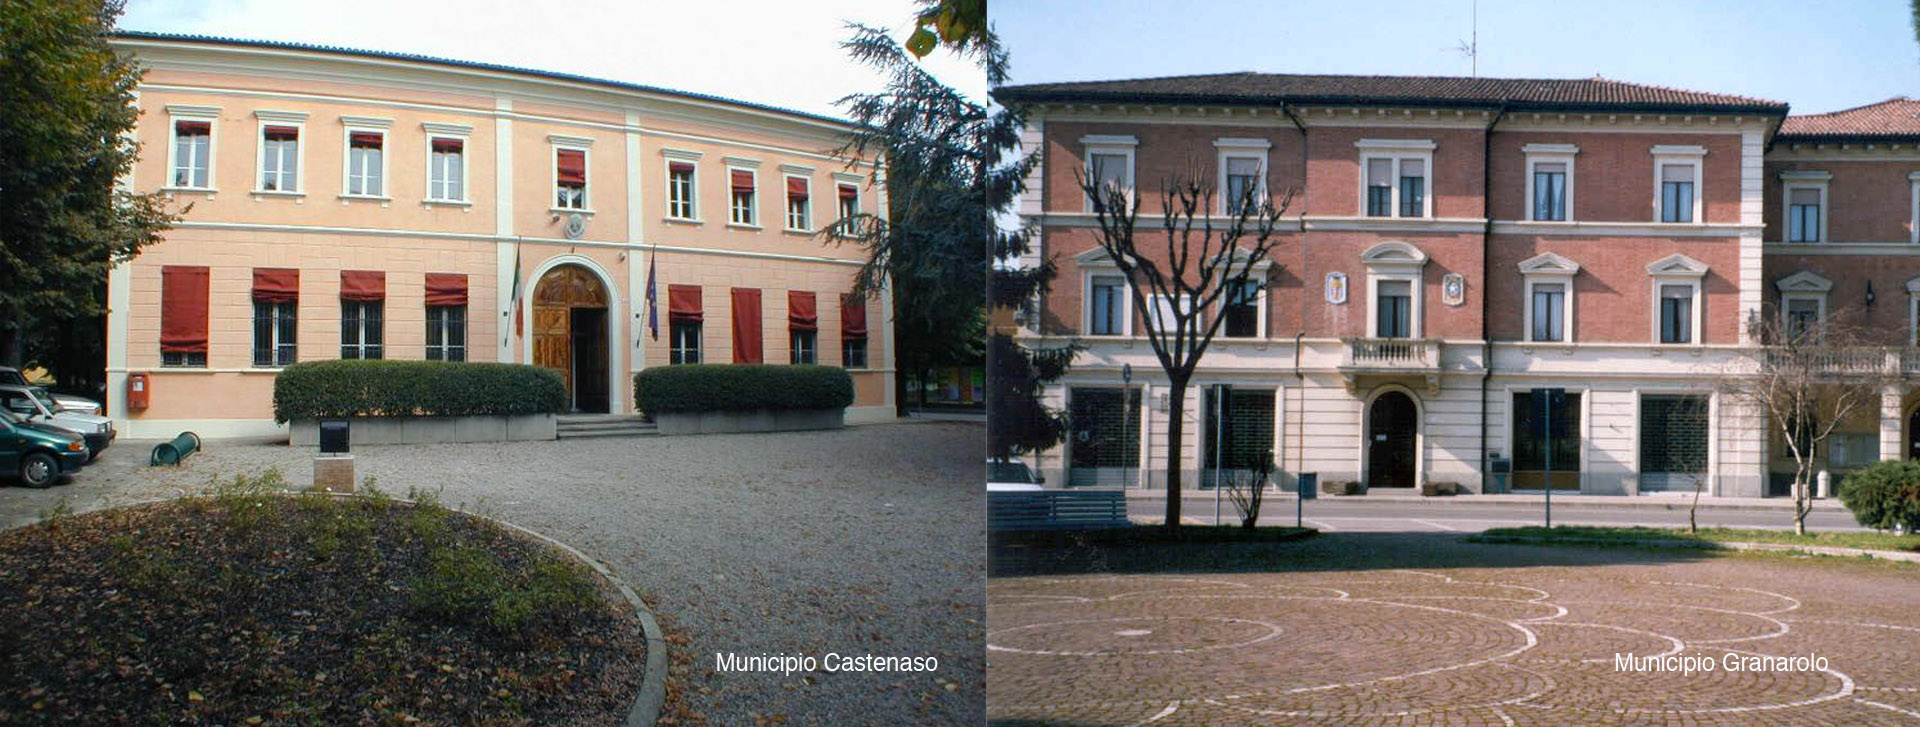 Panoramica - Archivio Città metropolitana di Bologna